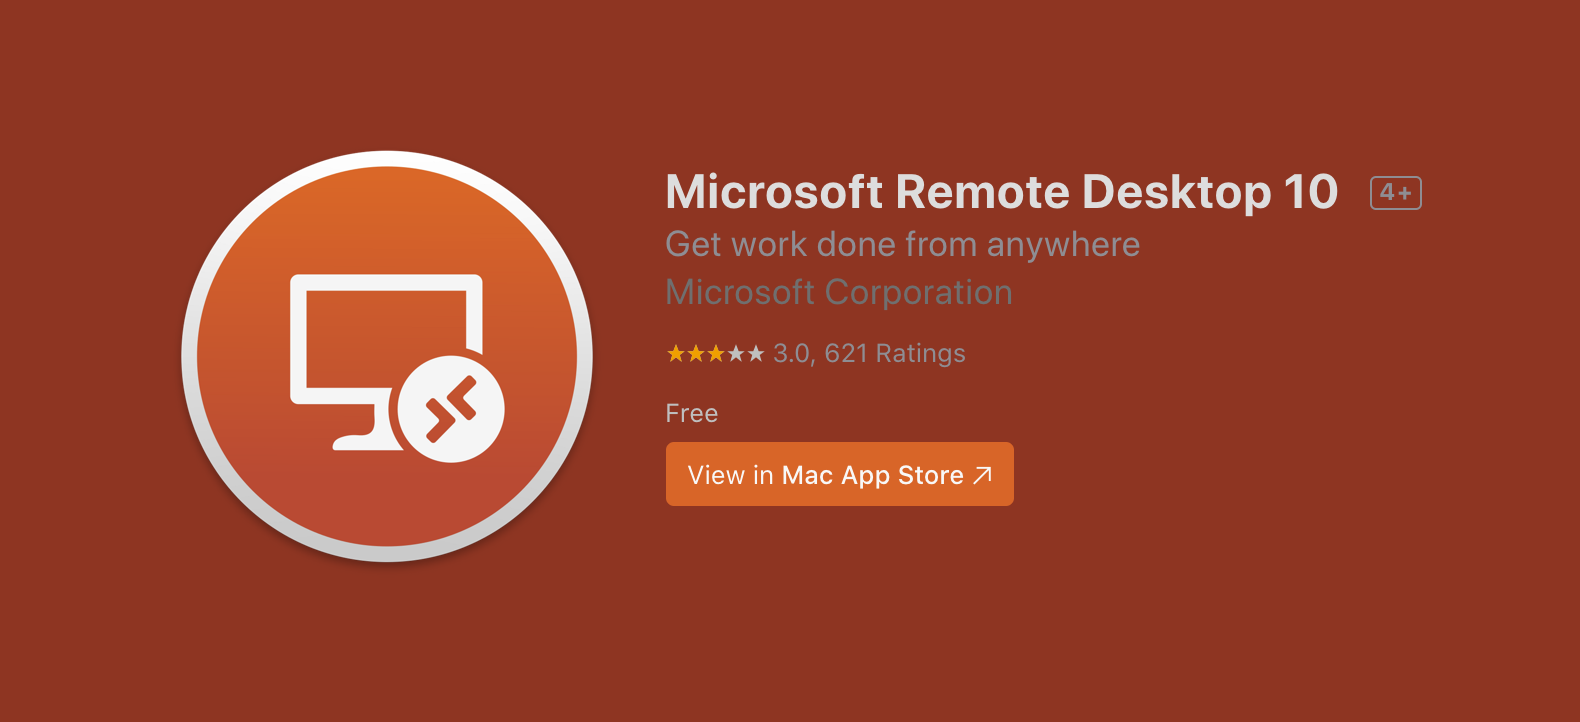 Mac 远程控制 Windows 软件 Microsoft Remote Desktop 10 汉化说明